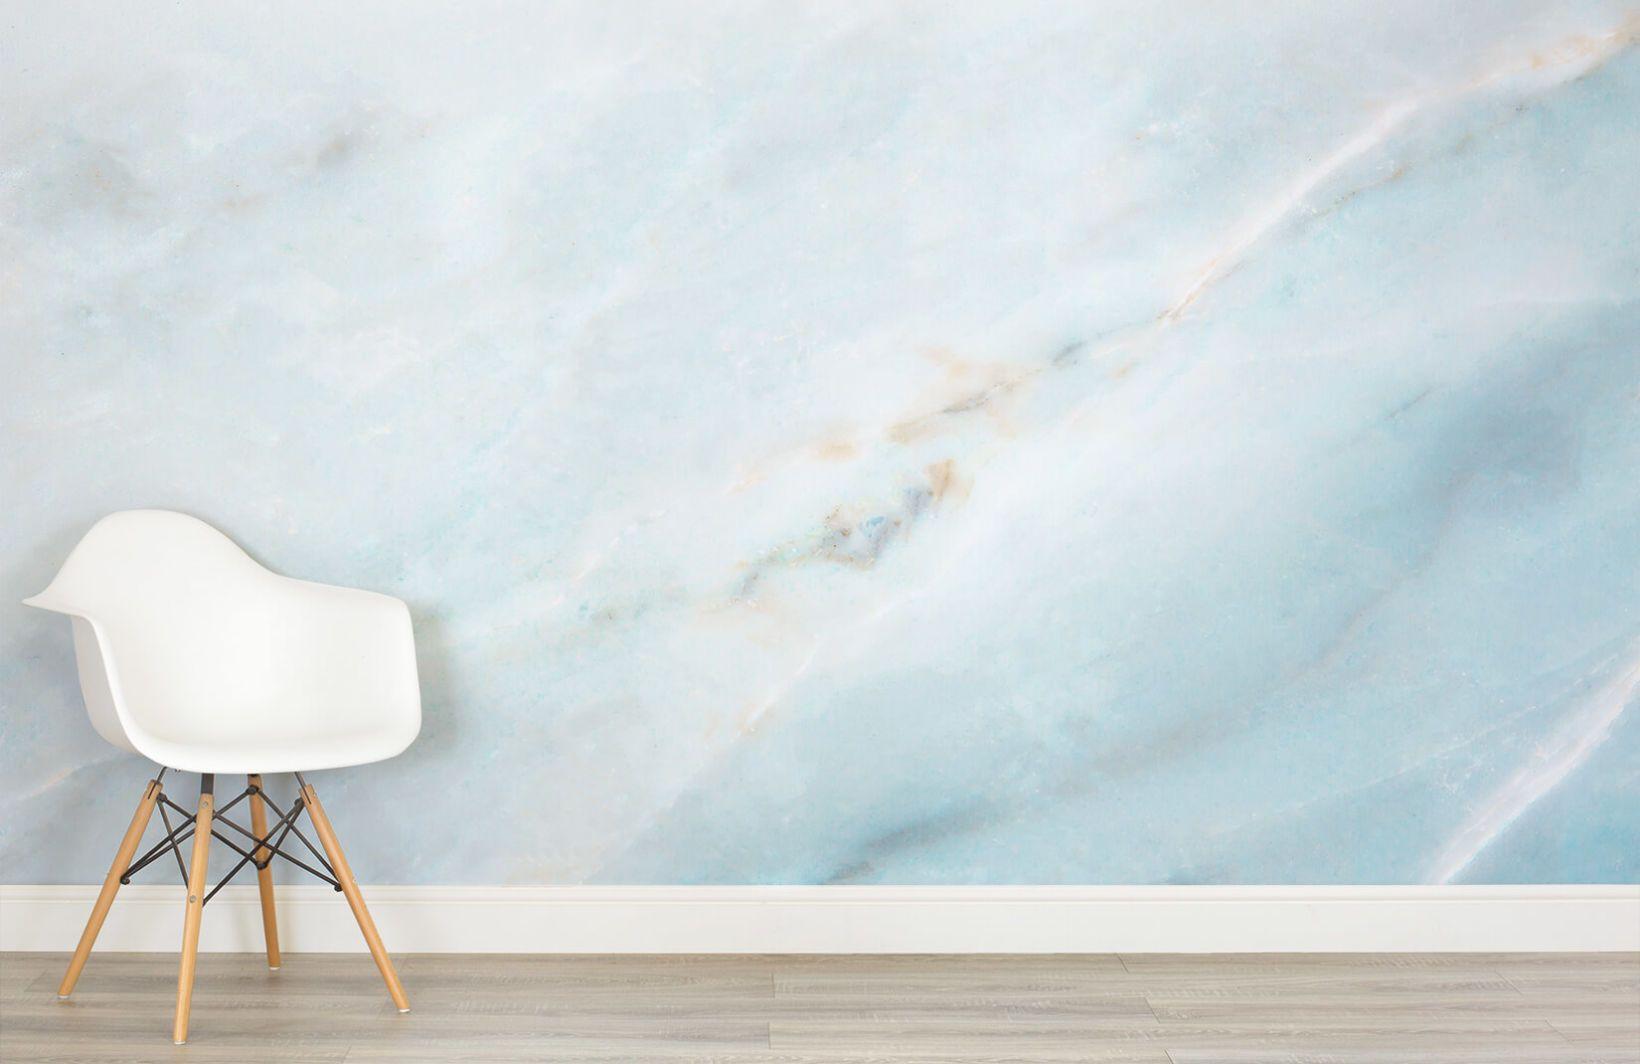 Wonderful Wallpaper Marble Blue - bfa0496b4c913f0cd9c93163c1d77336  Snapshot_477454.jpg